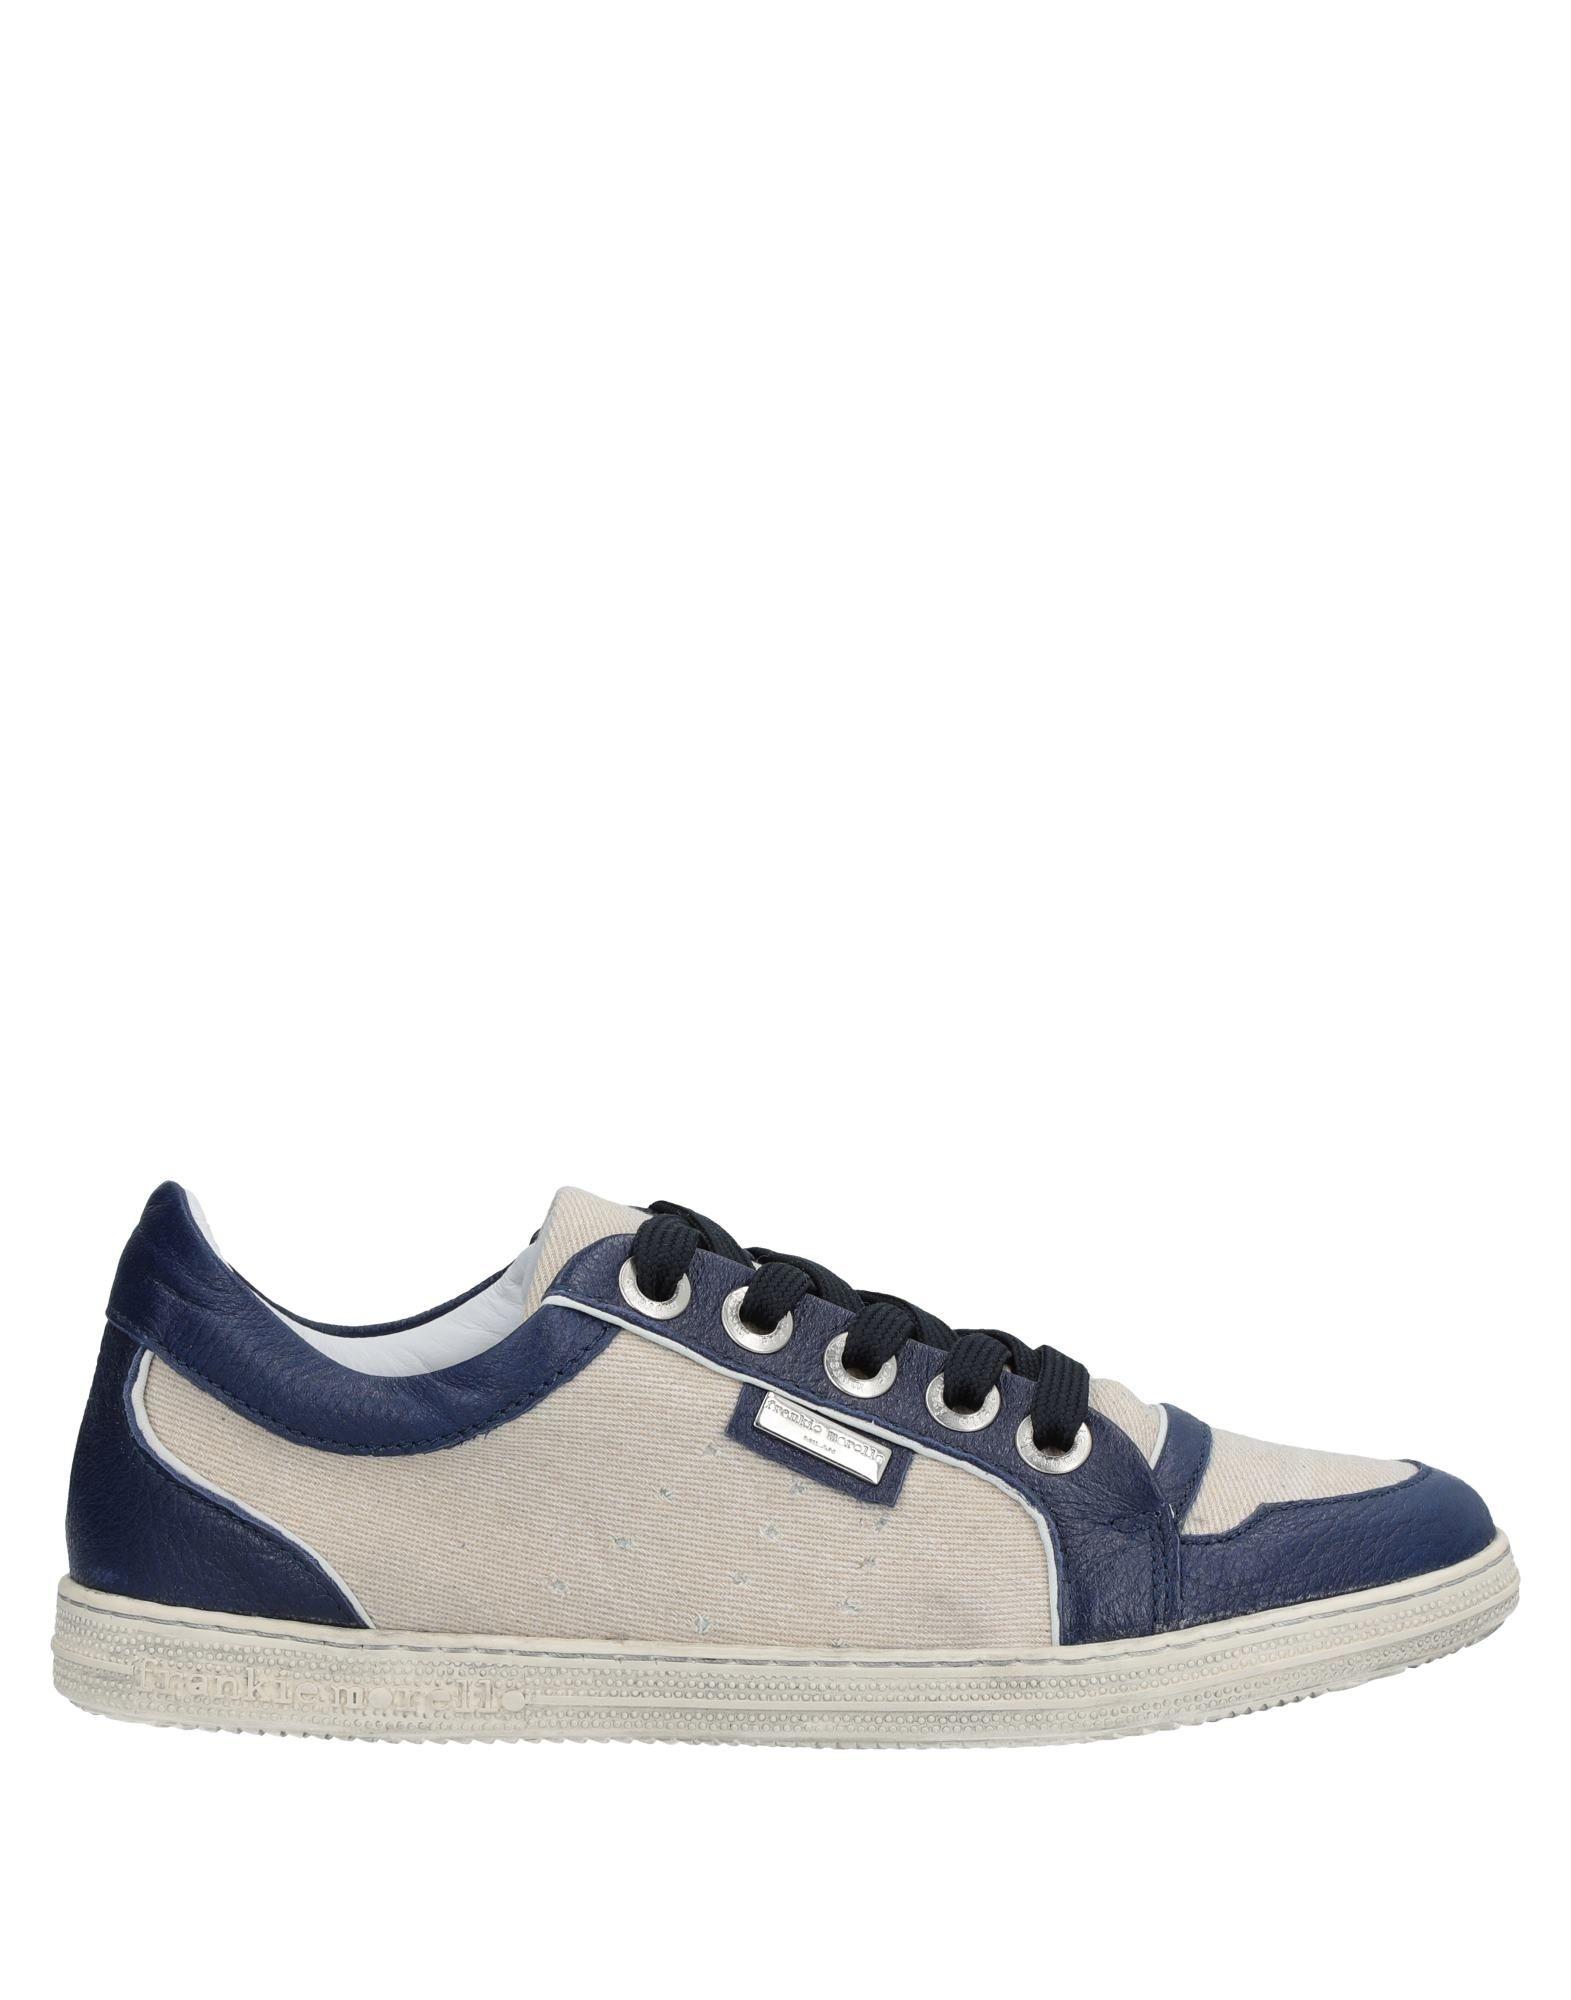 Frankie Morello Sneakers - Men Frankie Frankie Frankie Morello Sneakers online on  United Kingdom - 11538416SU 0ae615